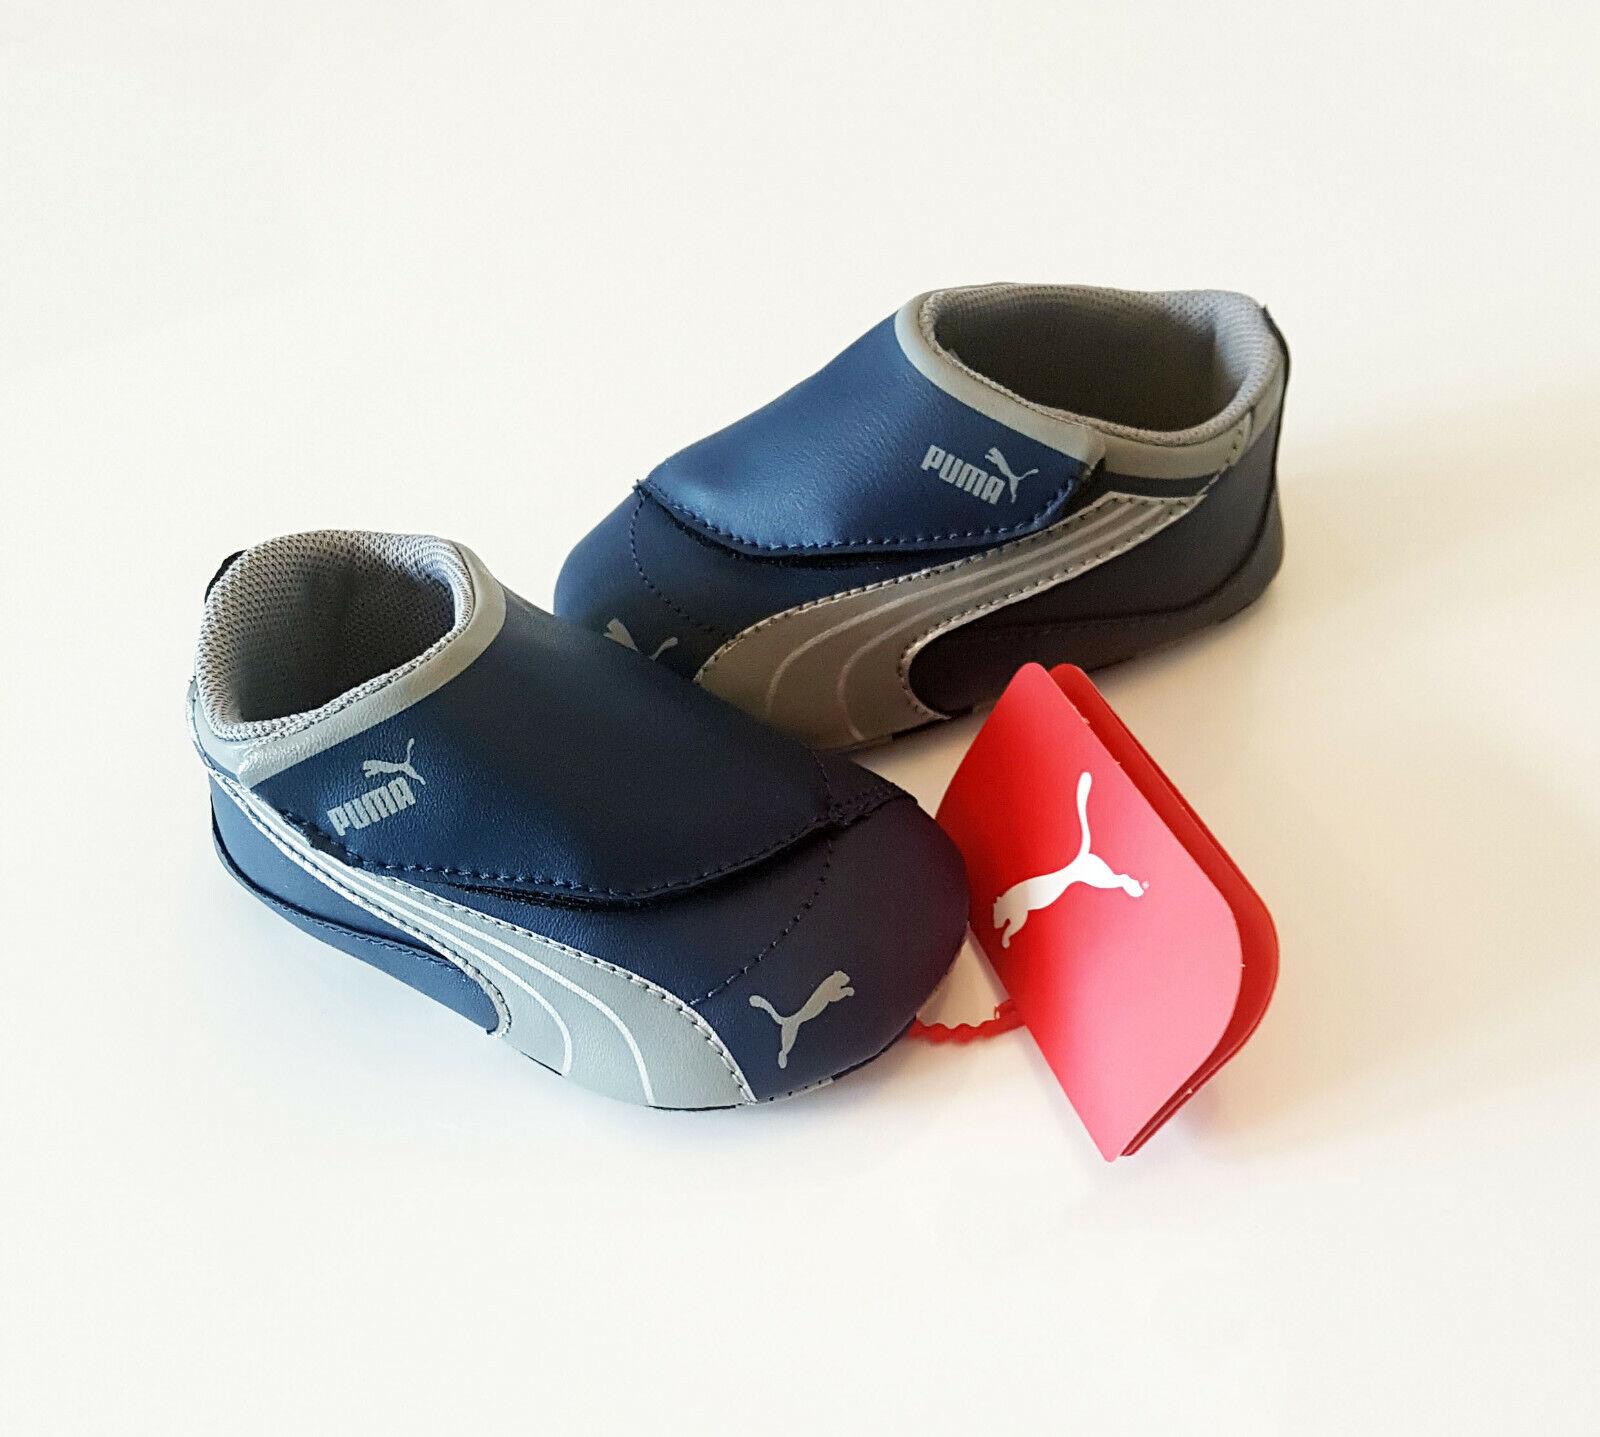 Puma Krabbelschuhe Laufschuhe Babyschuhe NEU Sneaker shoes baby infant